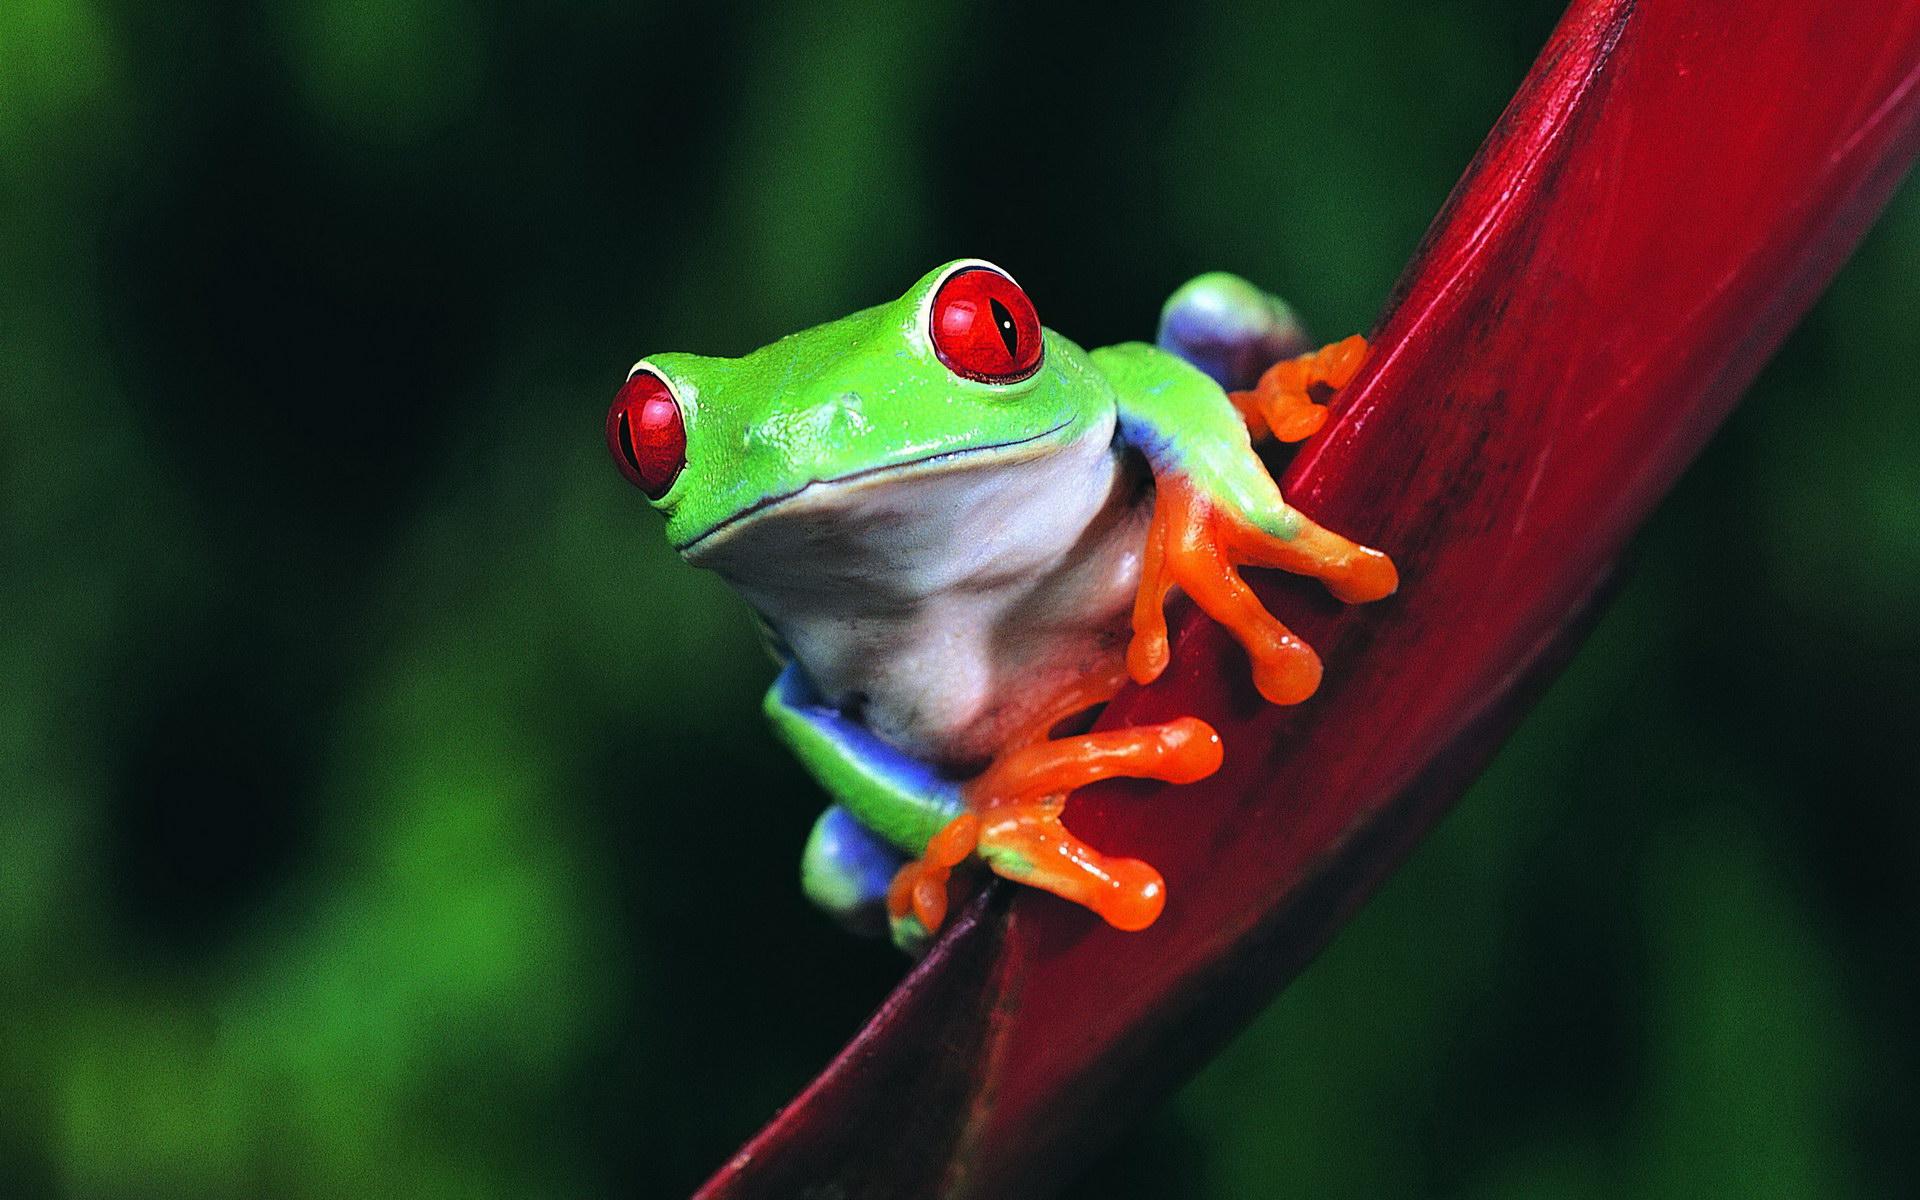 Beautiful Frog Wallpaper Download For Free Goats Animal: Frog Computer Wallpapers, Desktop Backgrounds